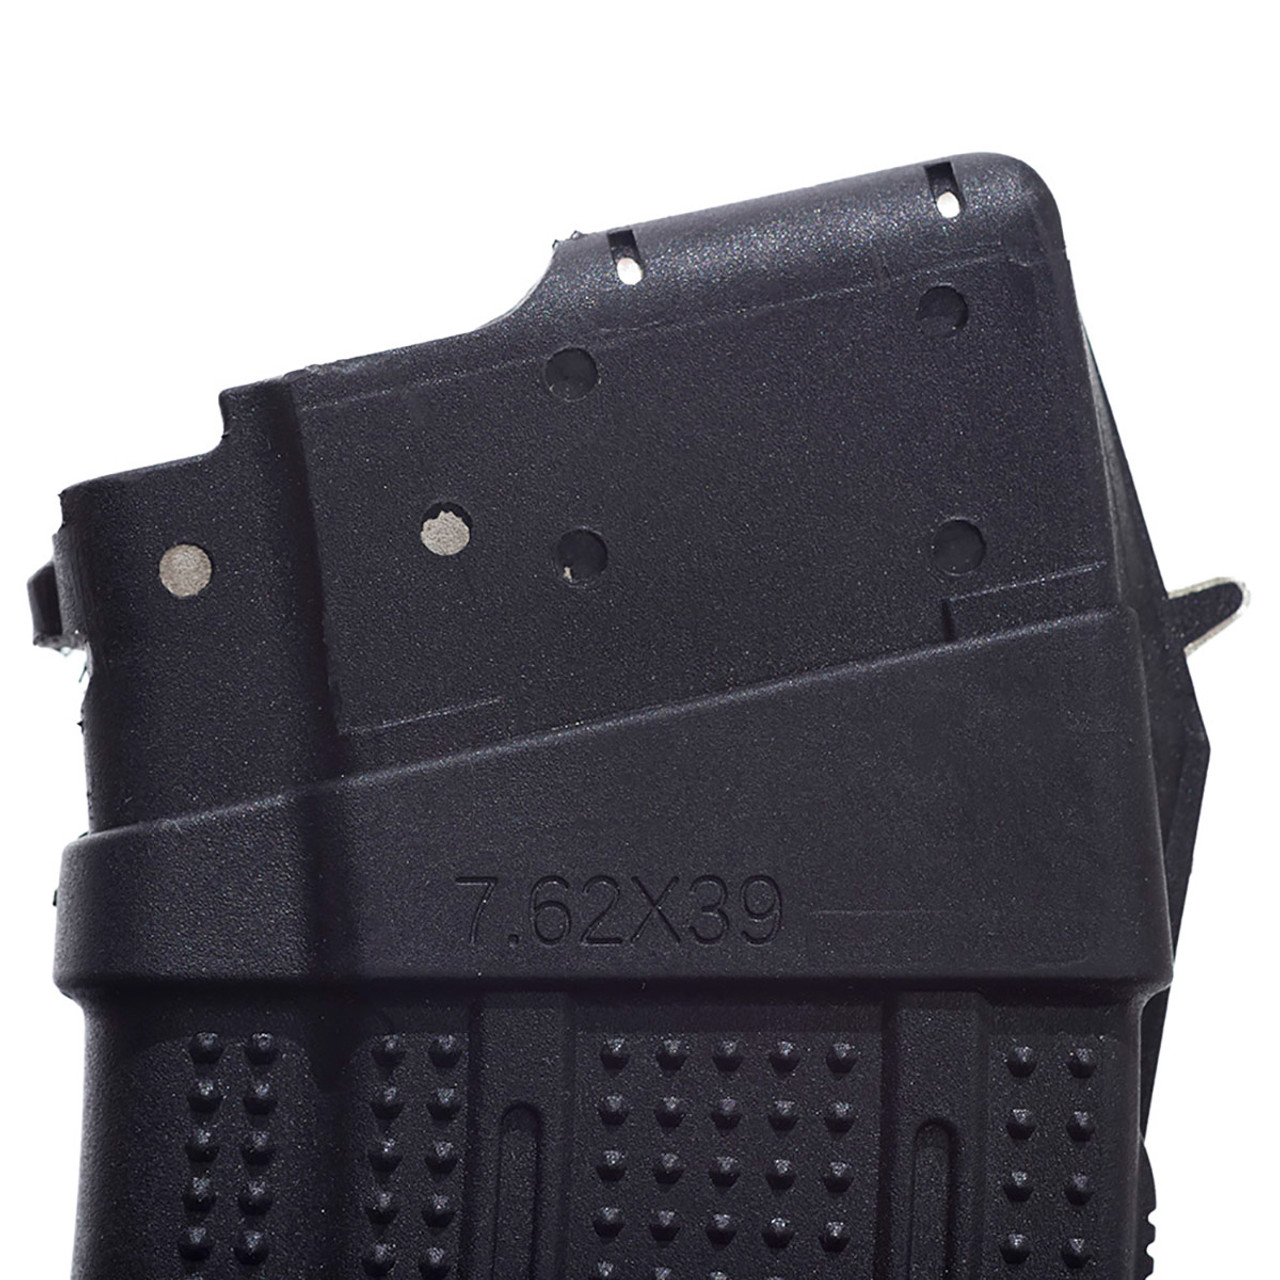 AK-47® 7.62x39mm (30) Rd - Steel Lined Black Polymer